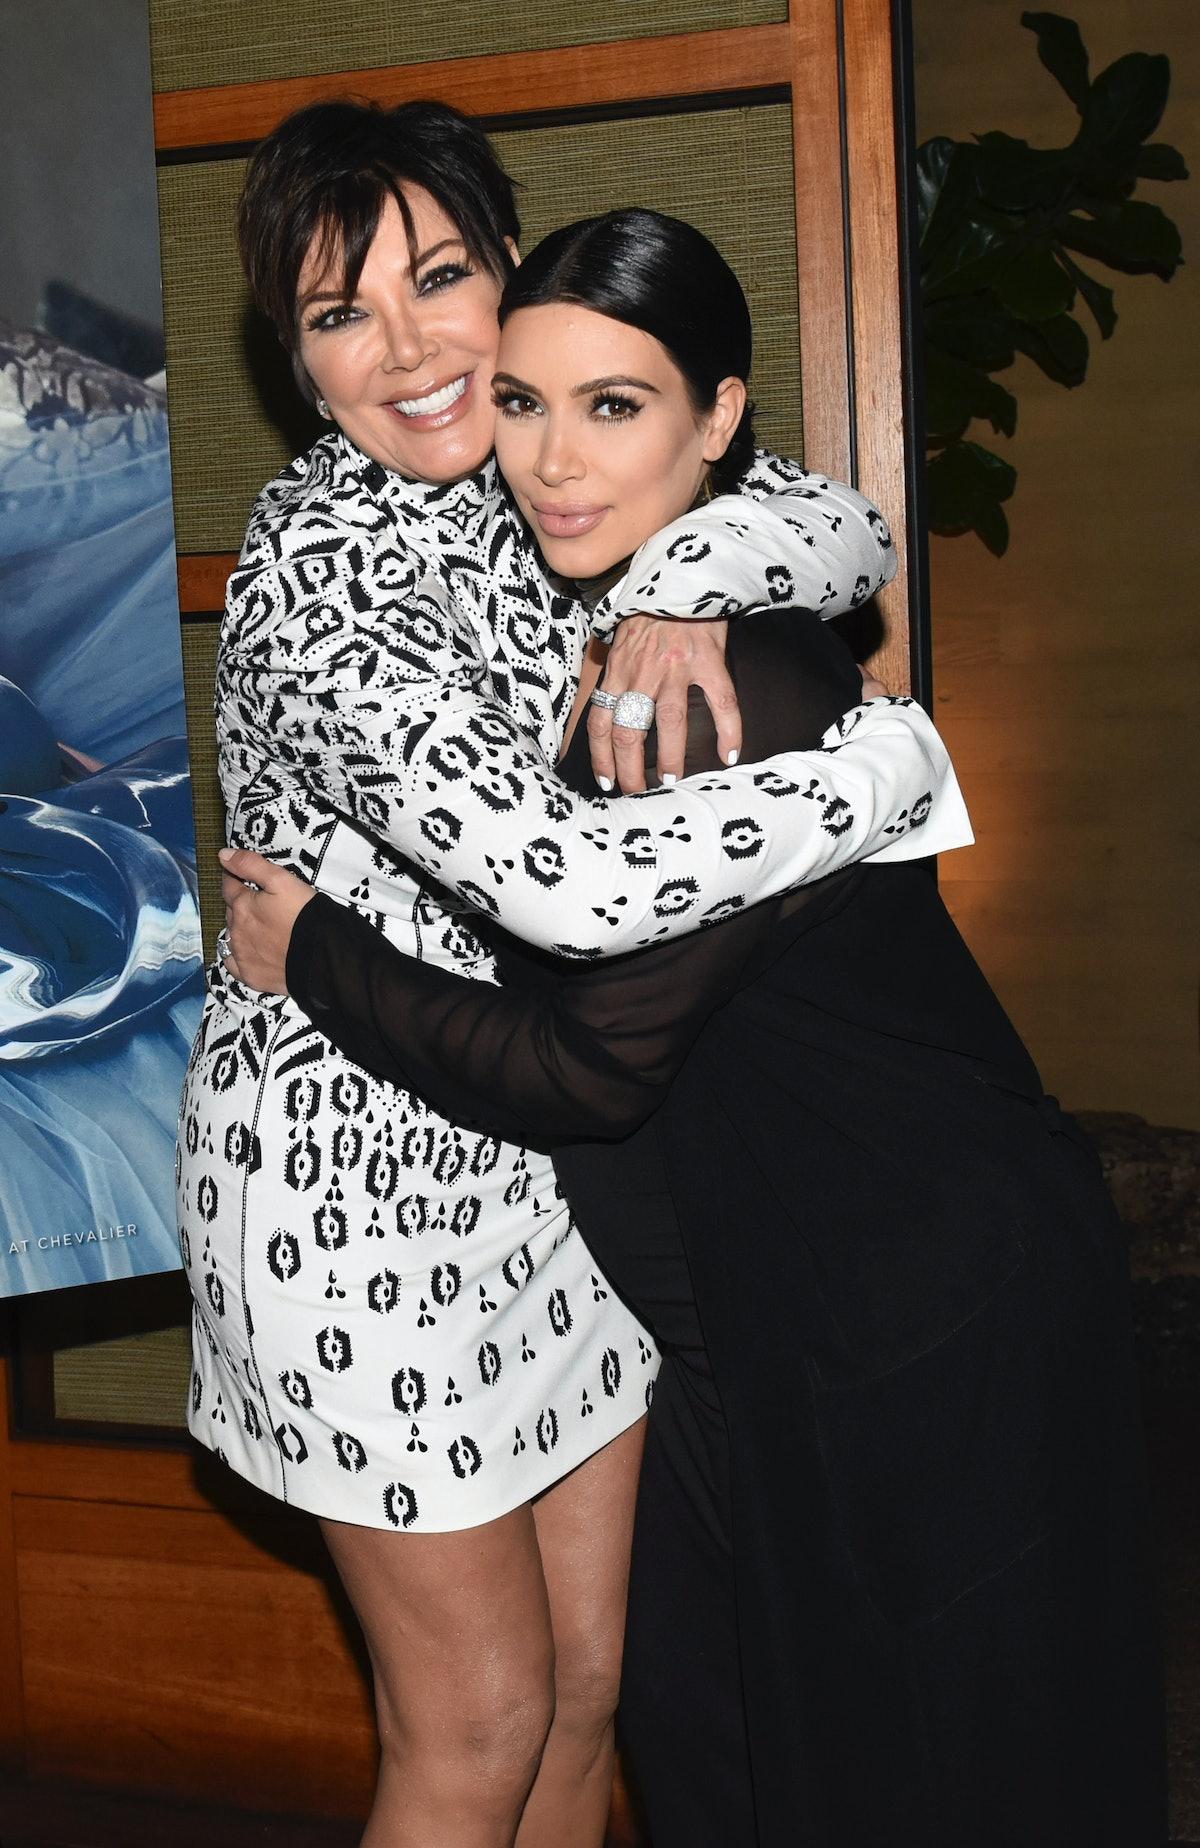 Kris Jenner and Kim Kardashian West